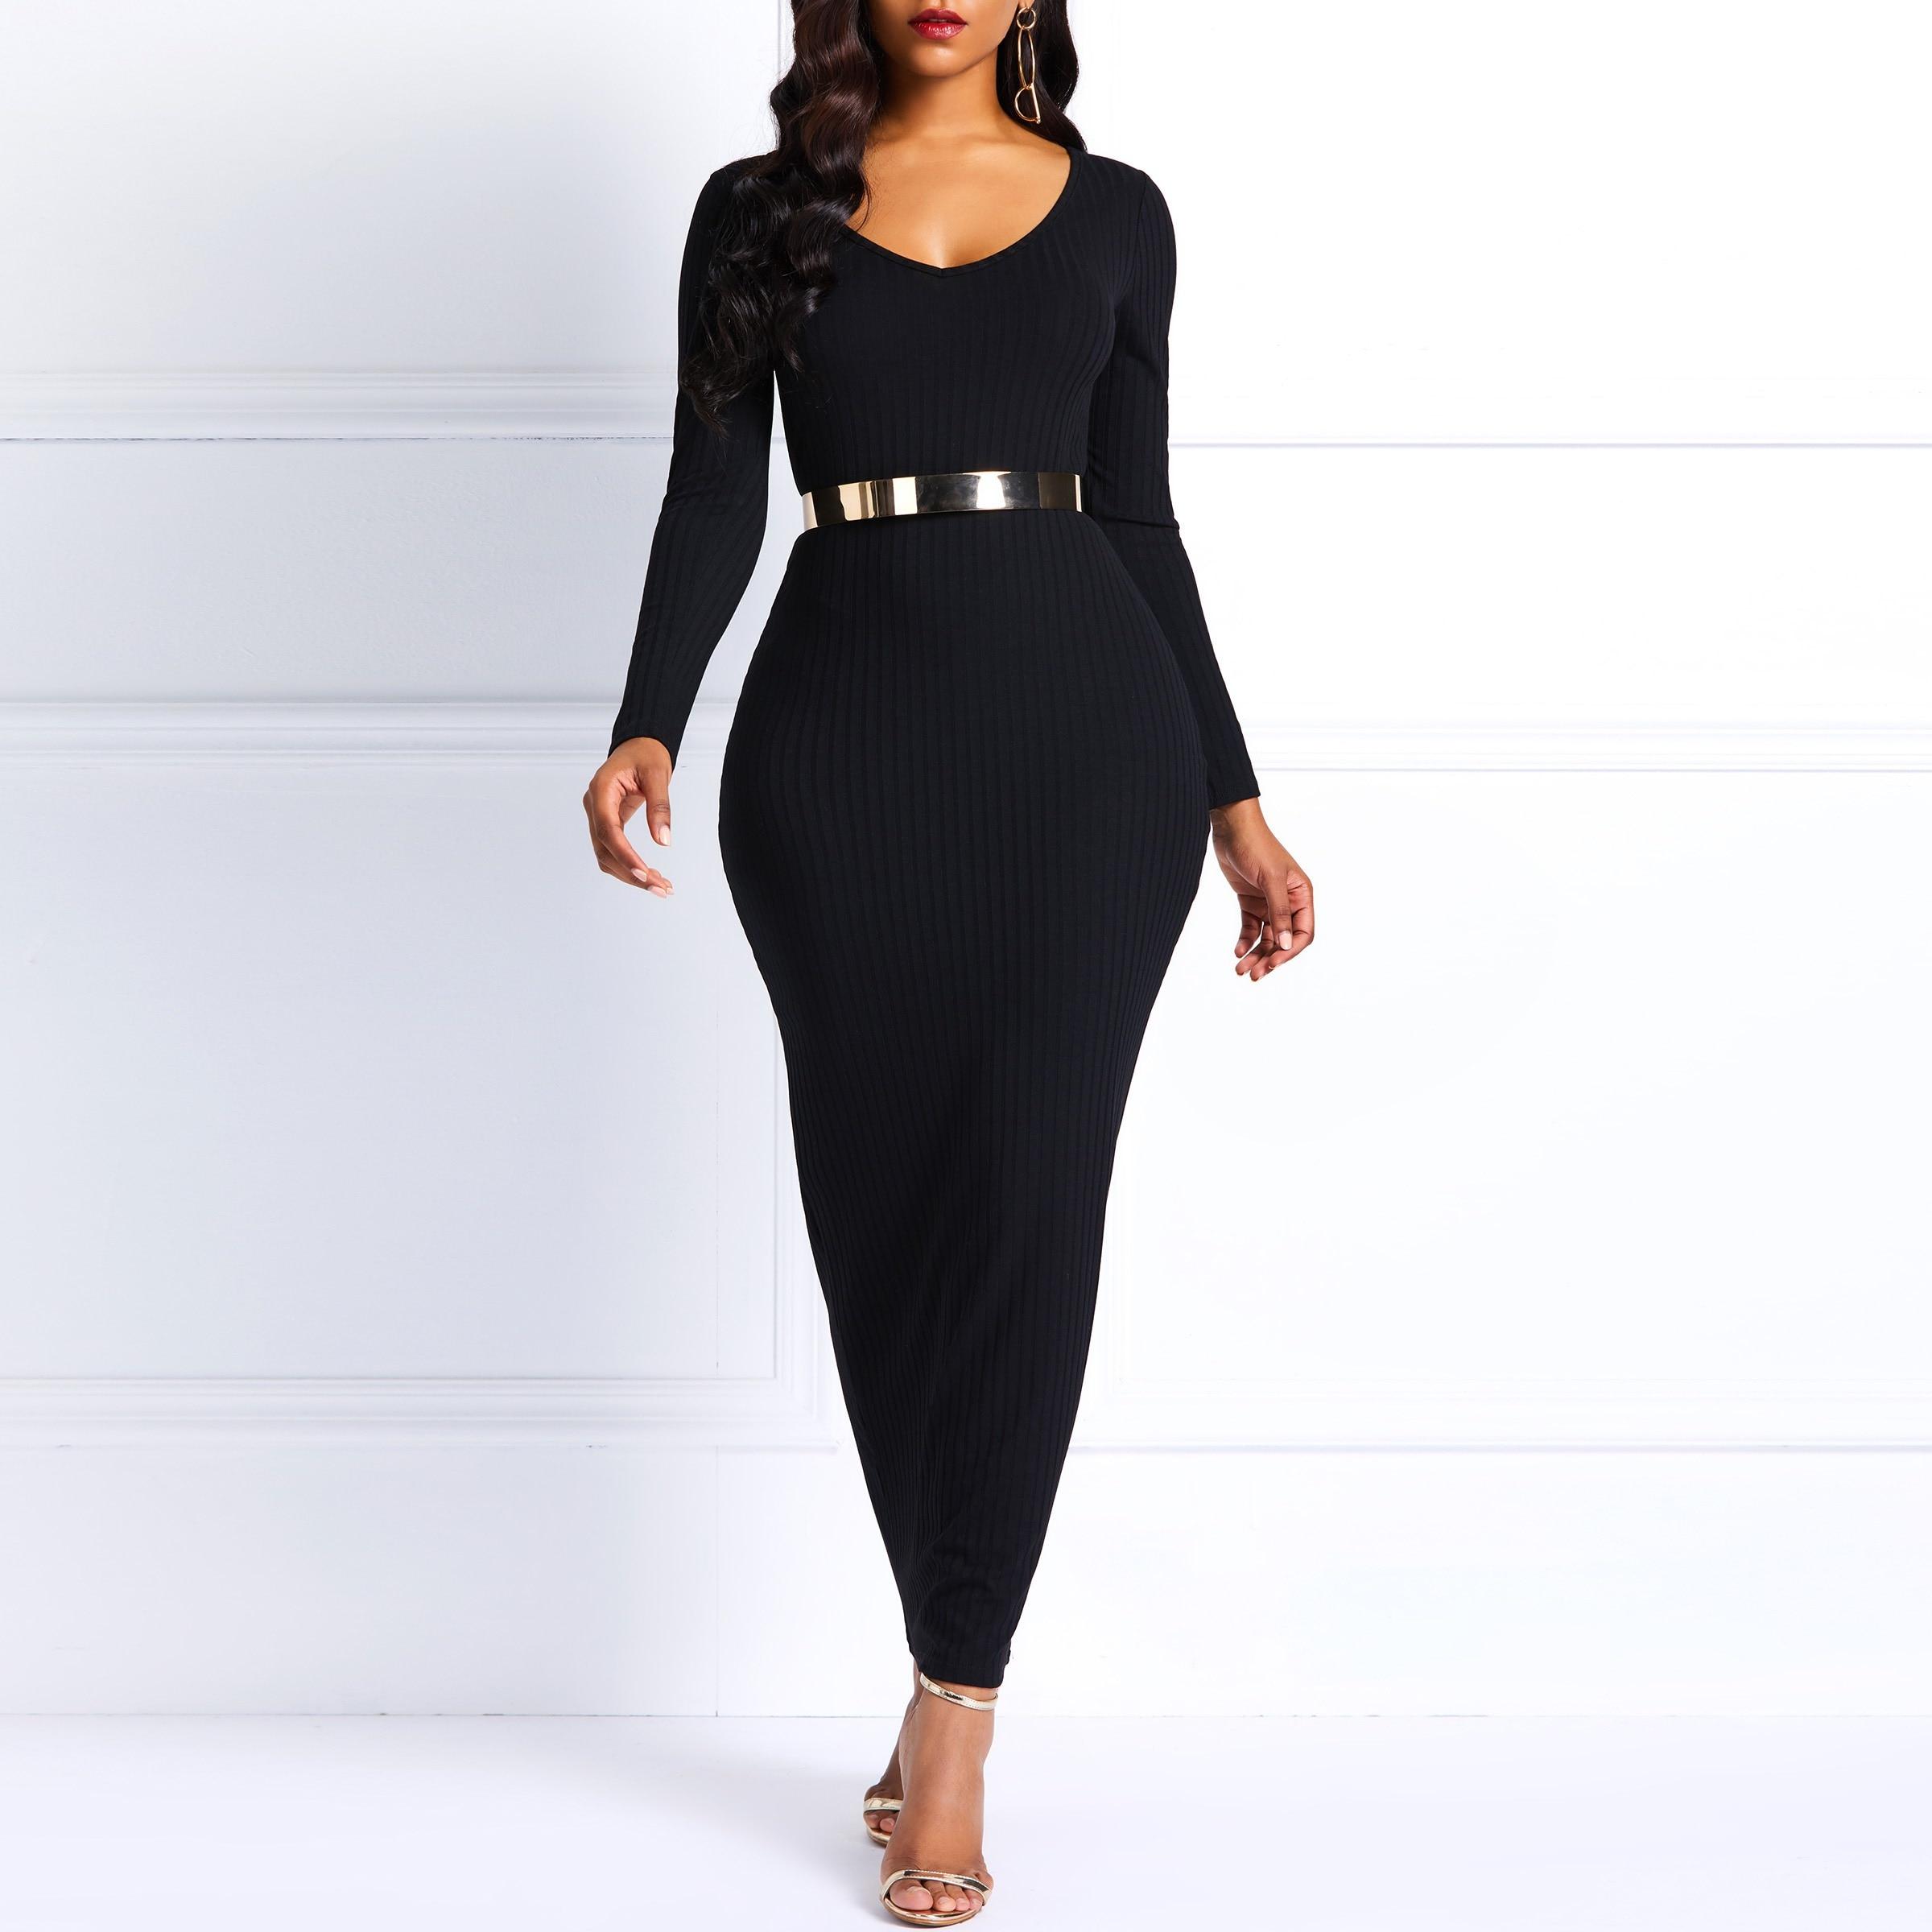 Bodycon dress long sleeve maxi winter dresses